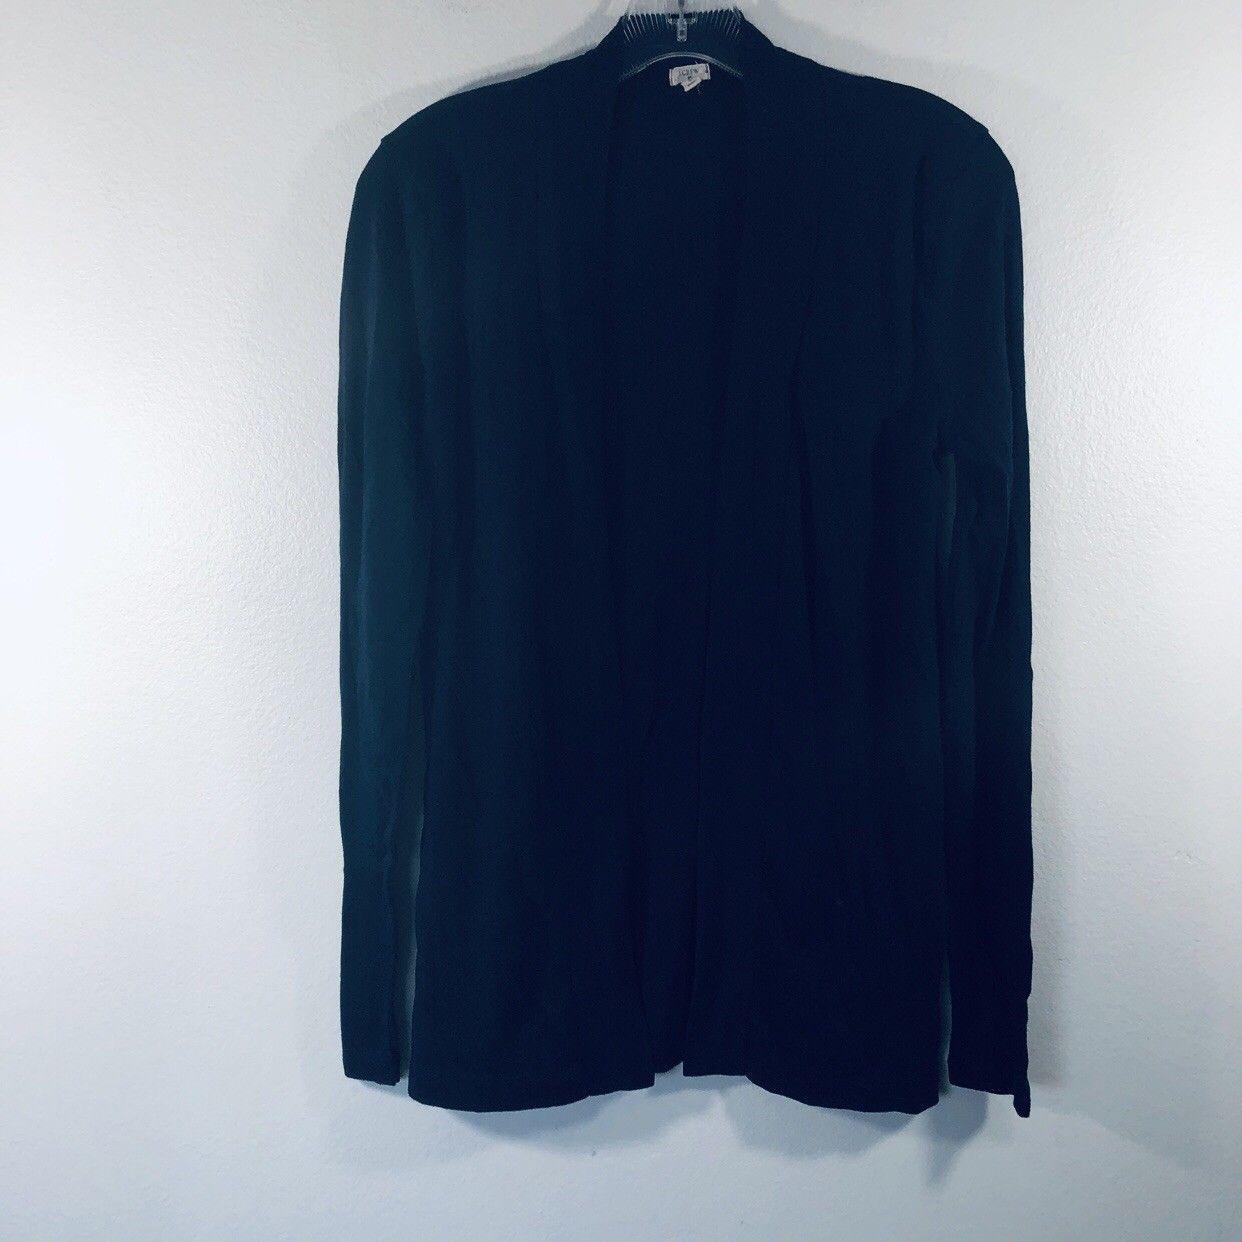 New J Crew Womens Deck Striped Crewneck Dip Dye Sweater Long Sleeve Blue White